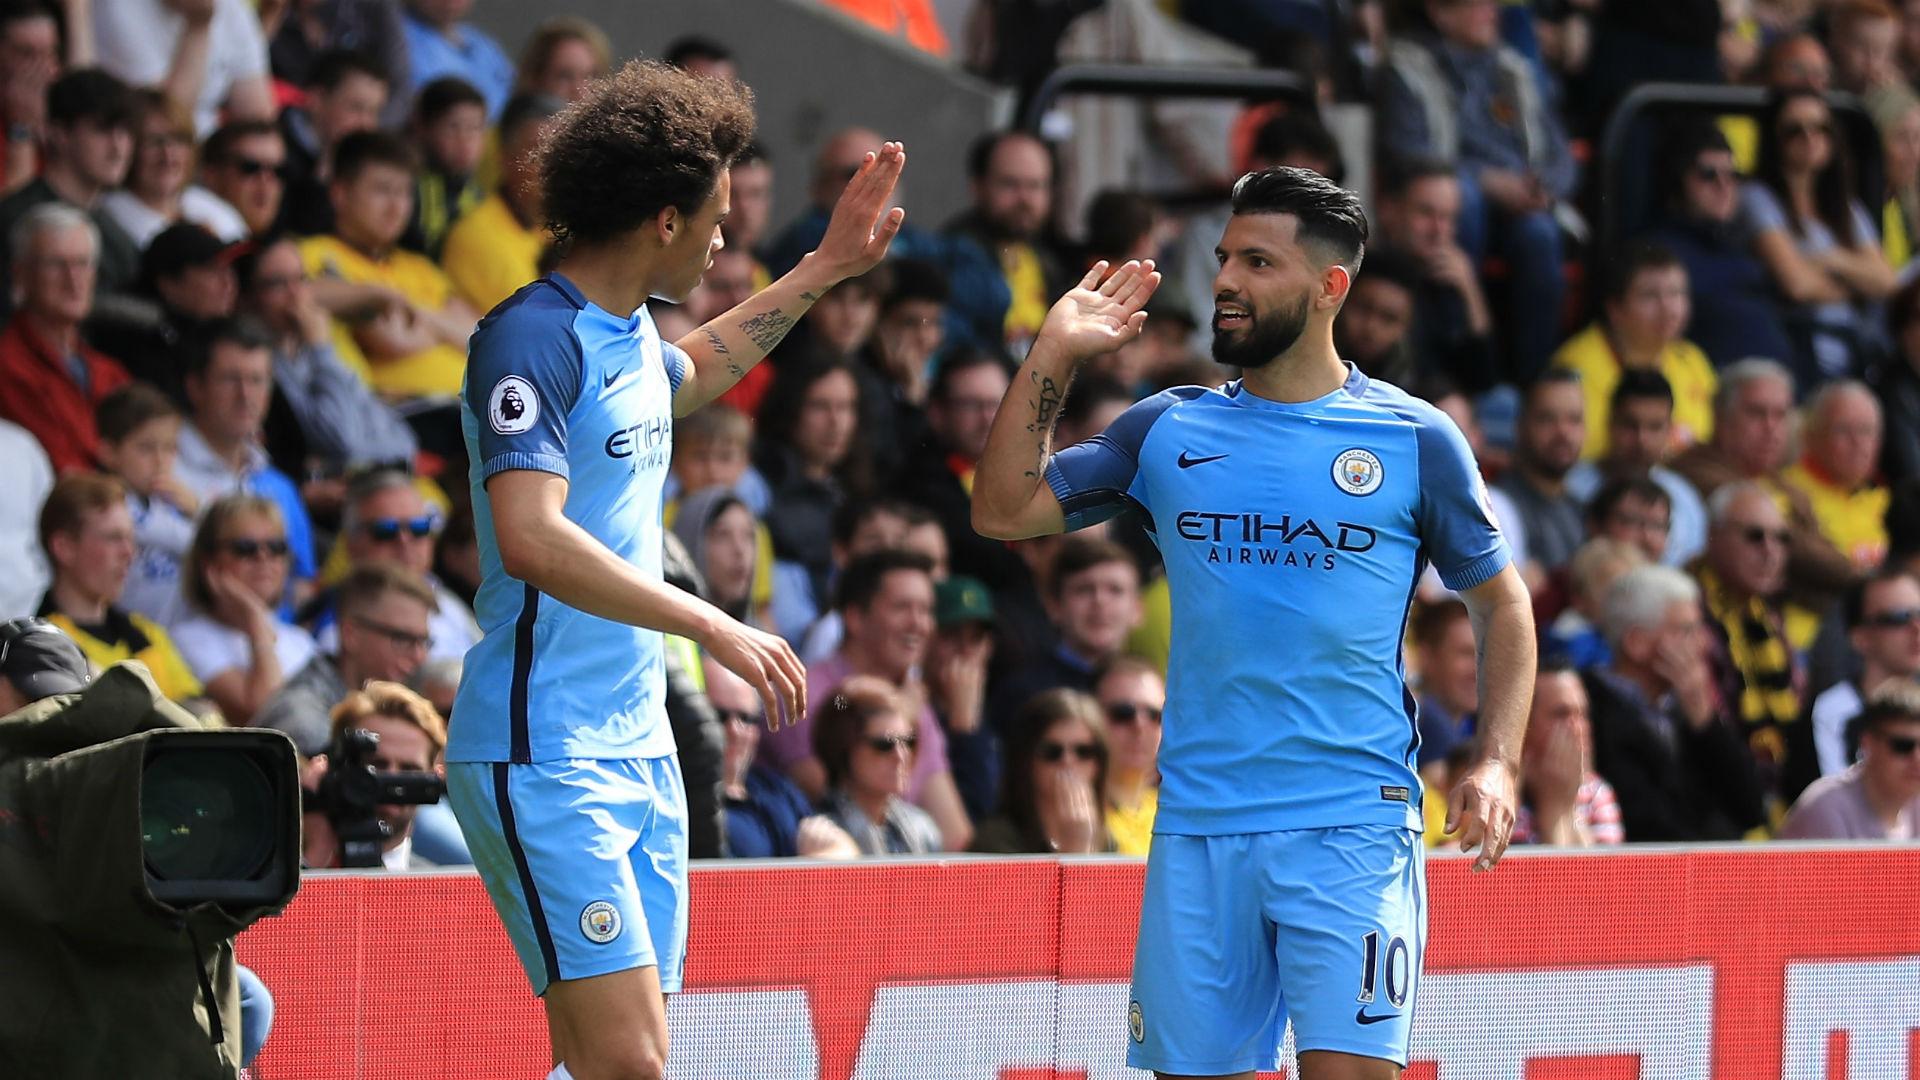 Guardiola: Aguero and Kompany are staying at Man City